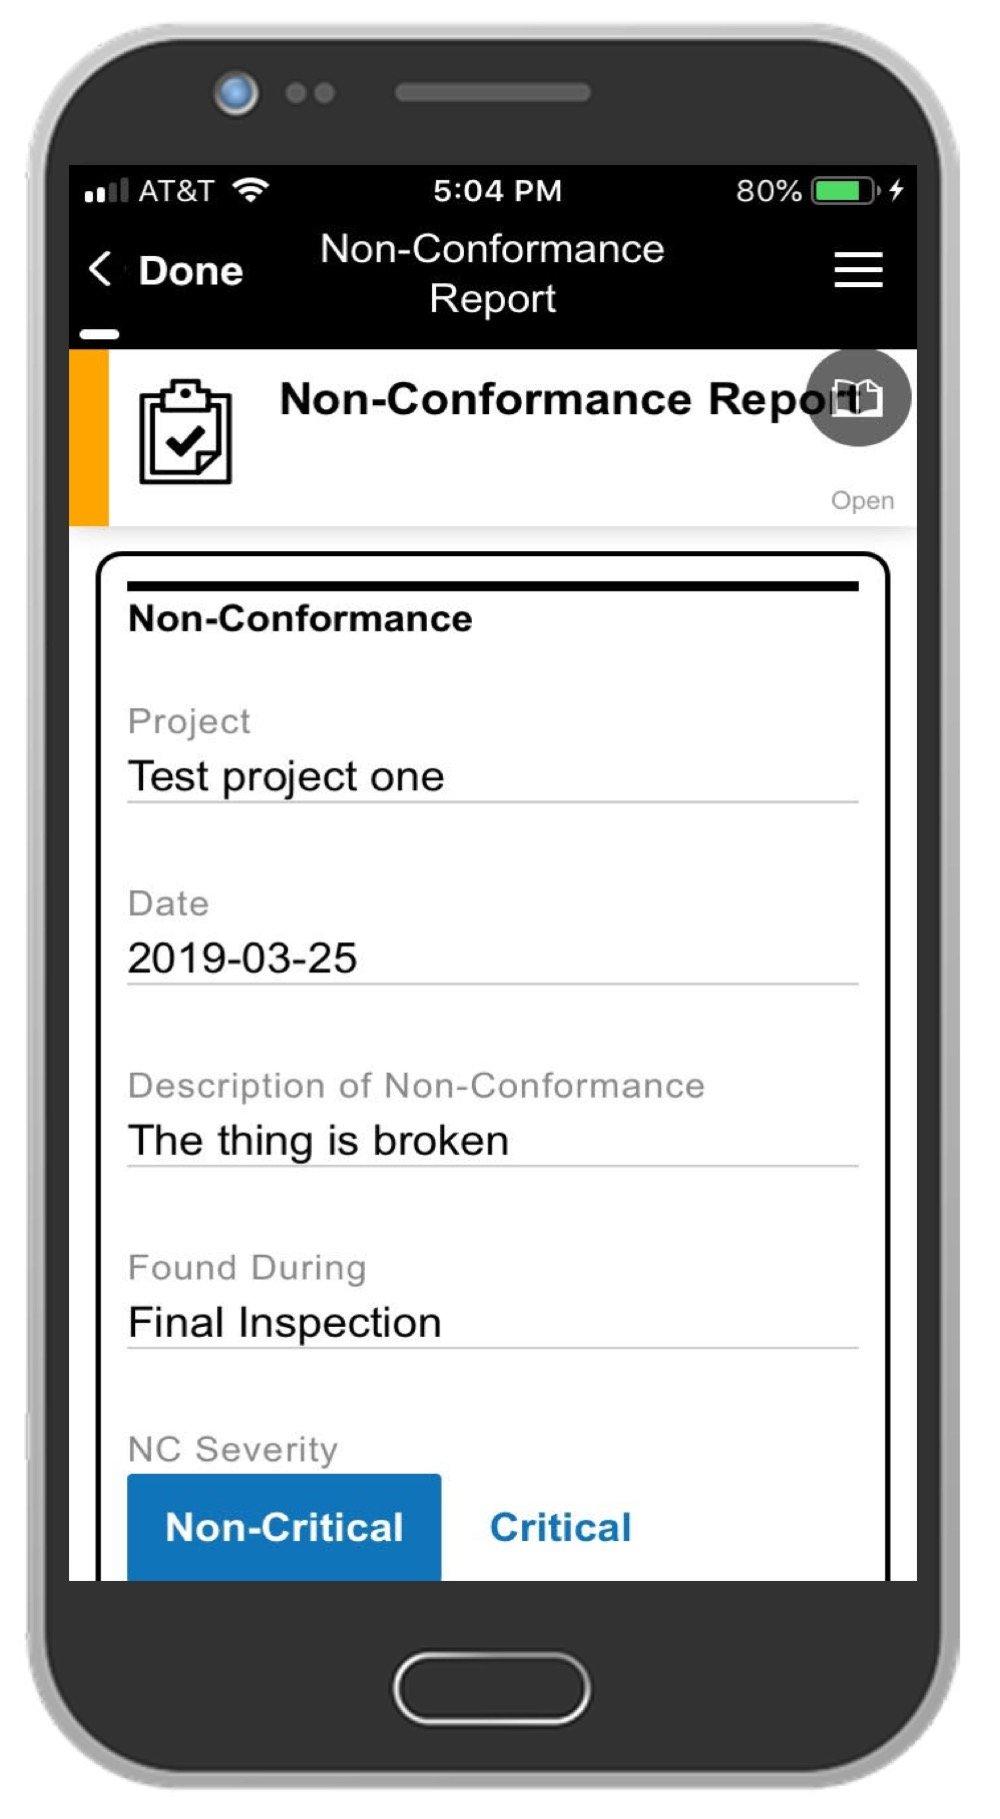 NCR App Screenshot 1